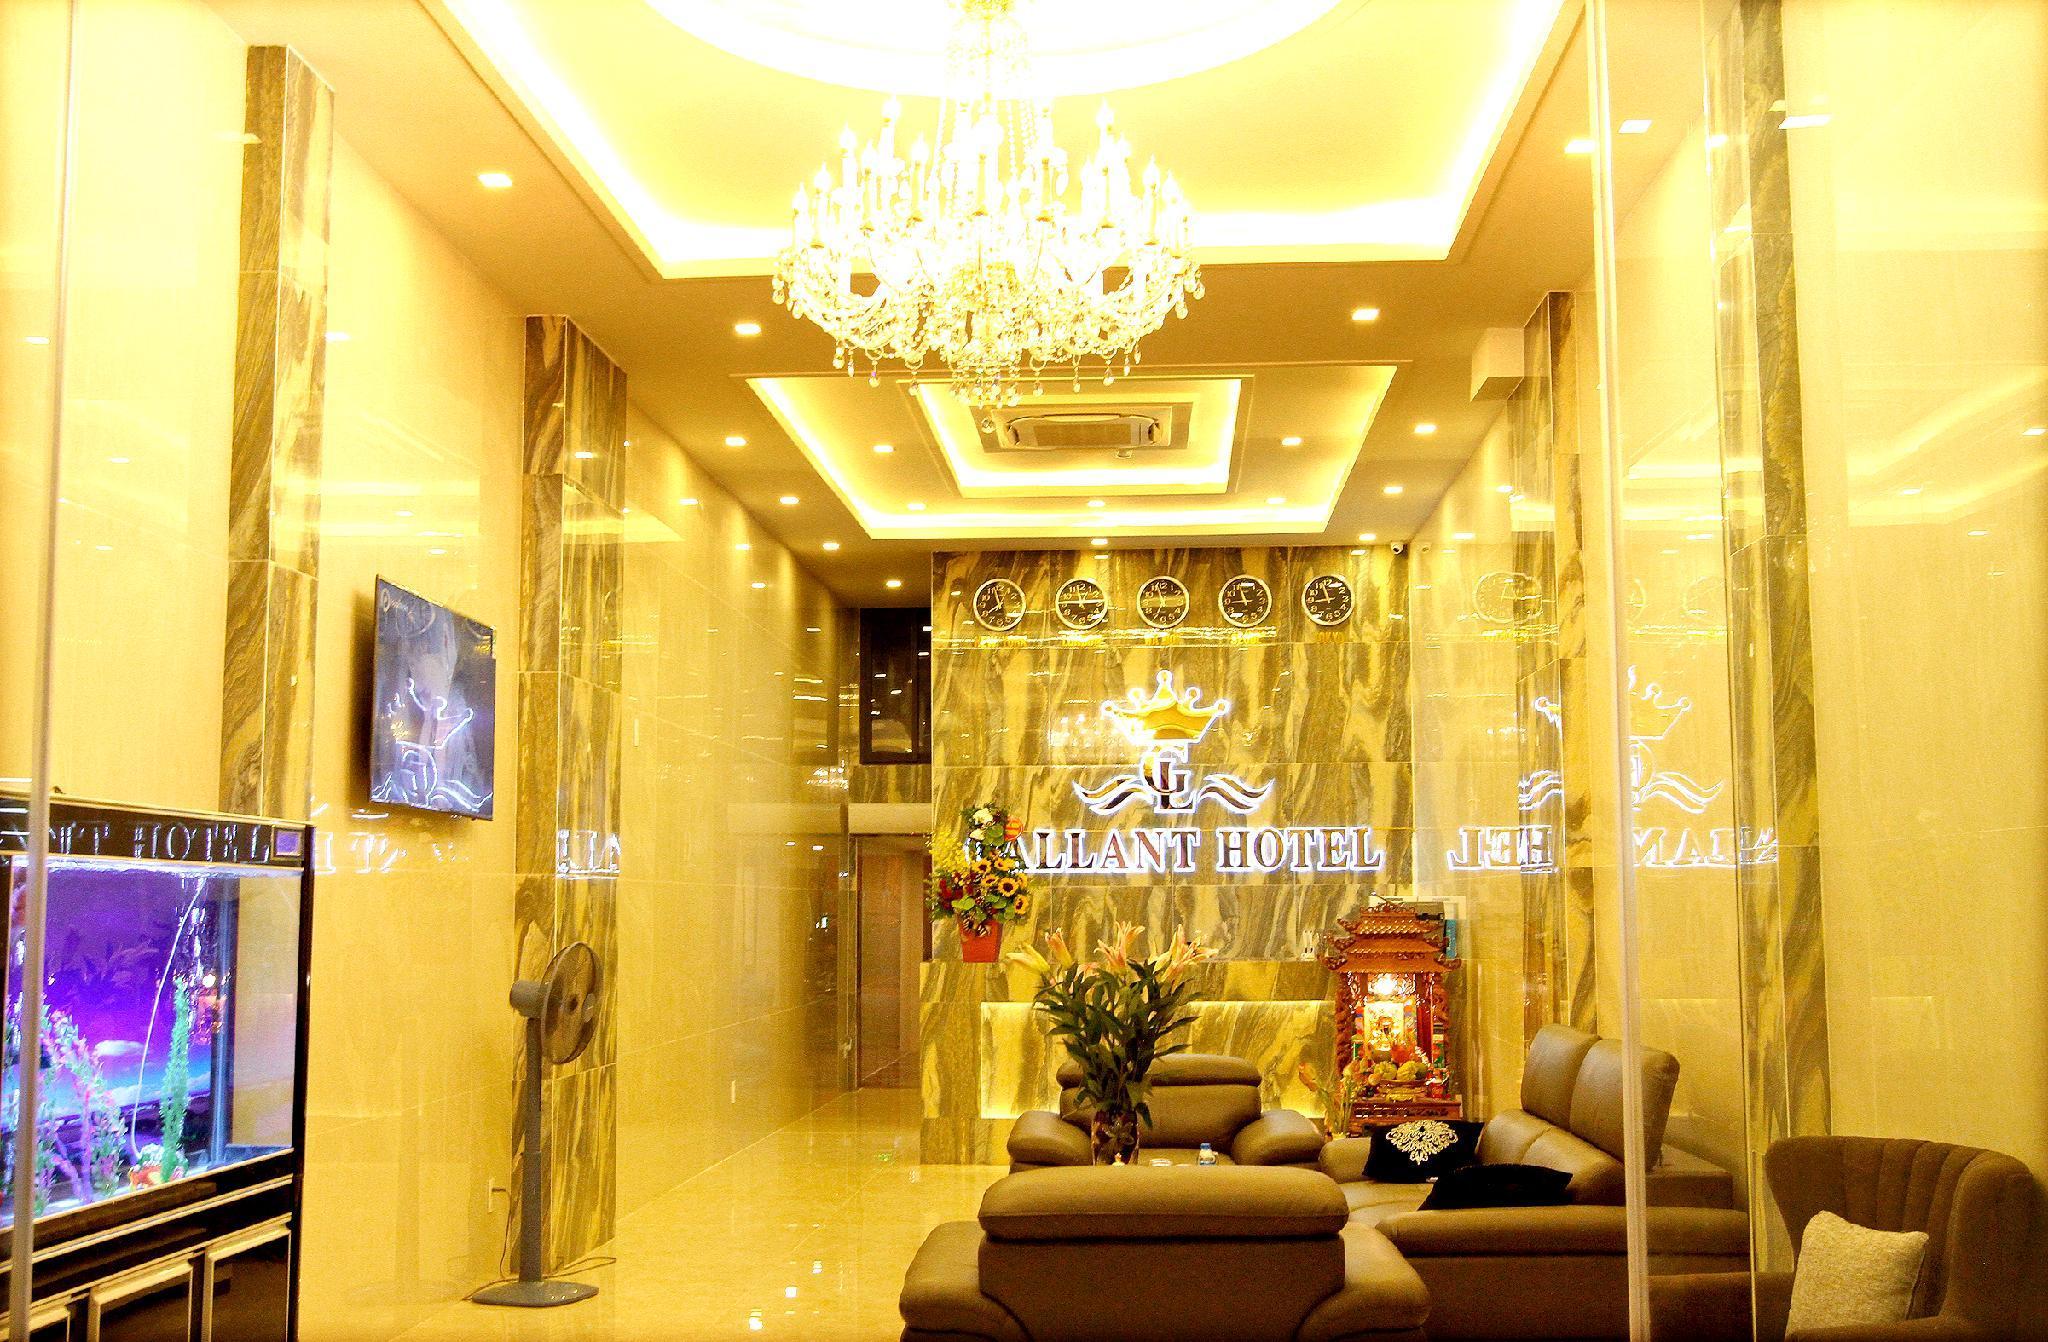 GALLANT HOTEL 154, Hải An